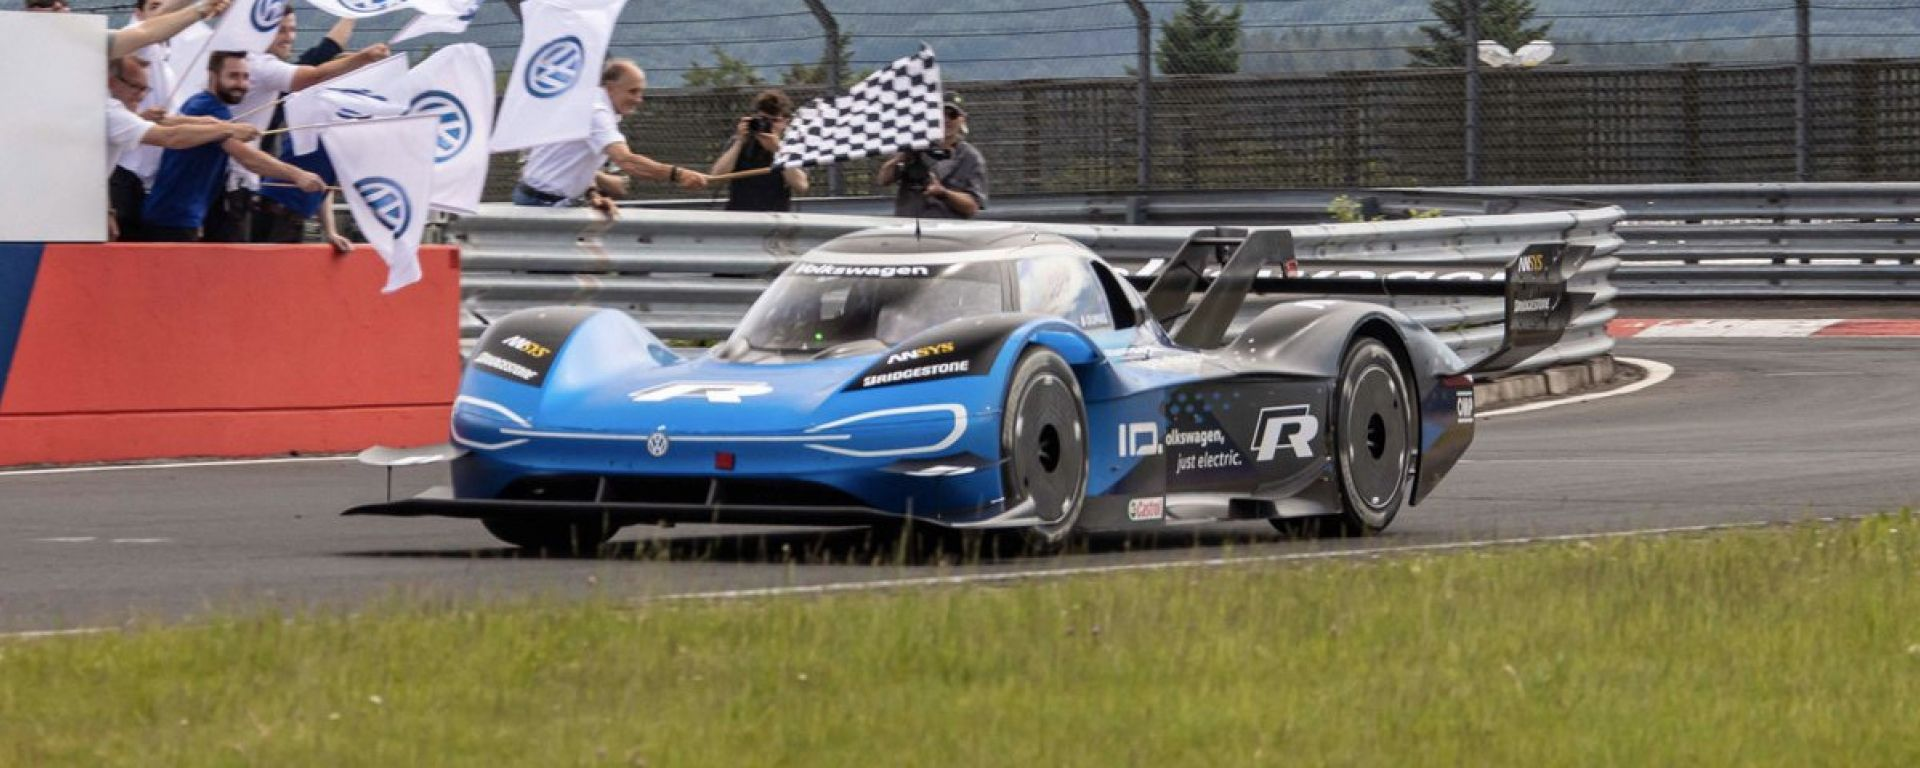 Volkswagen ID.R, è record per un'elettrica al Nürburgring